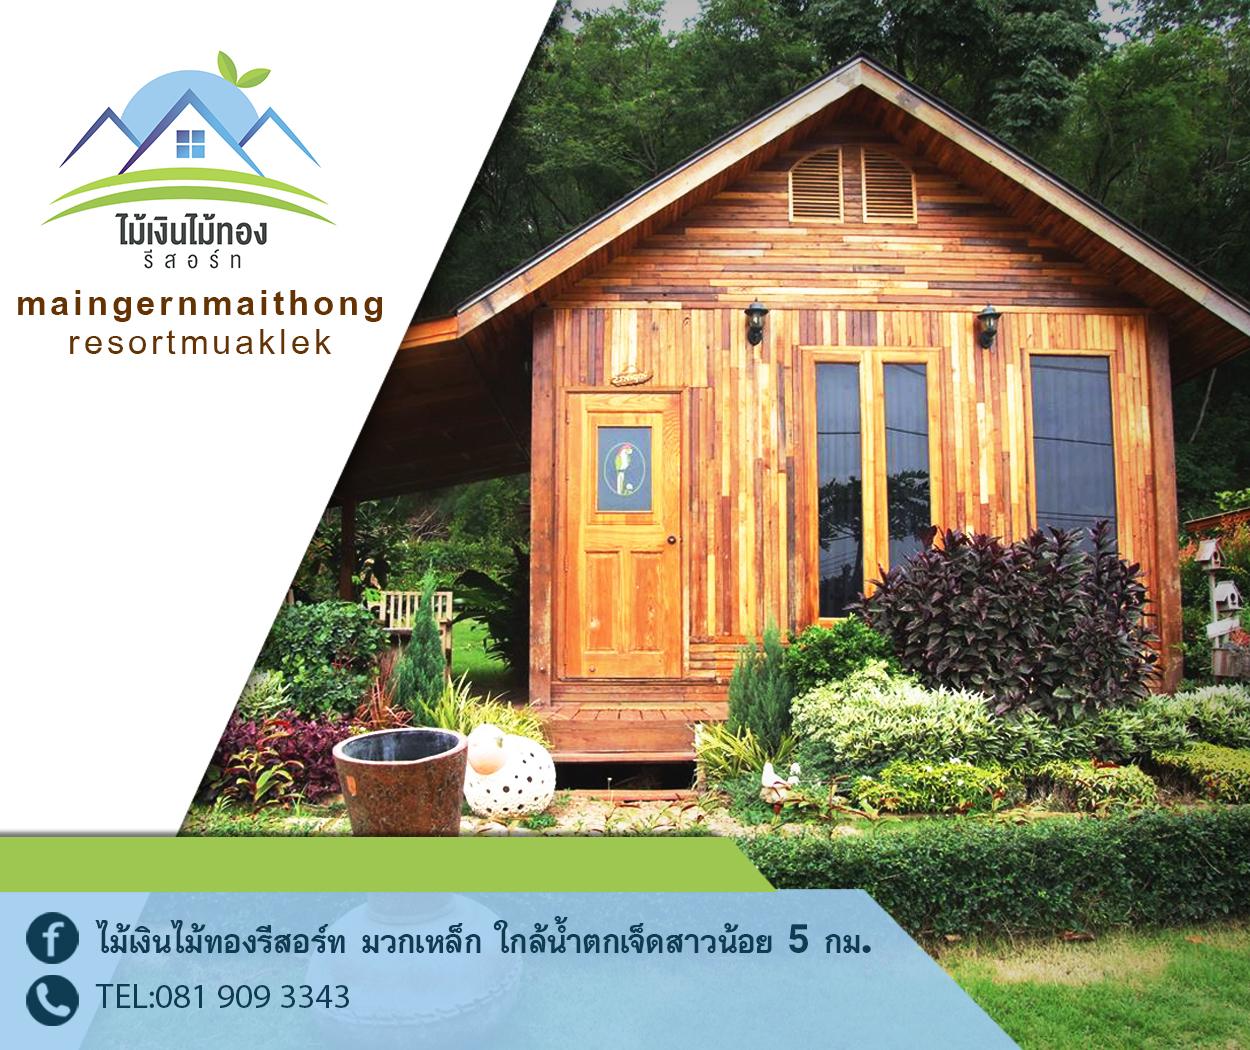 Maingern Maithong Resort Saraburi